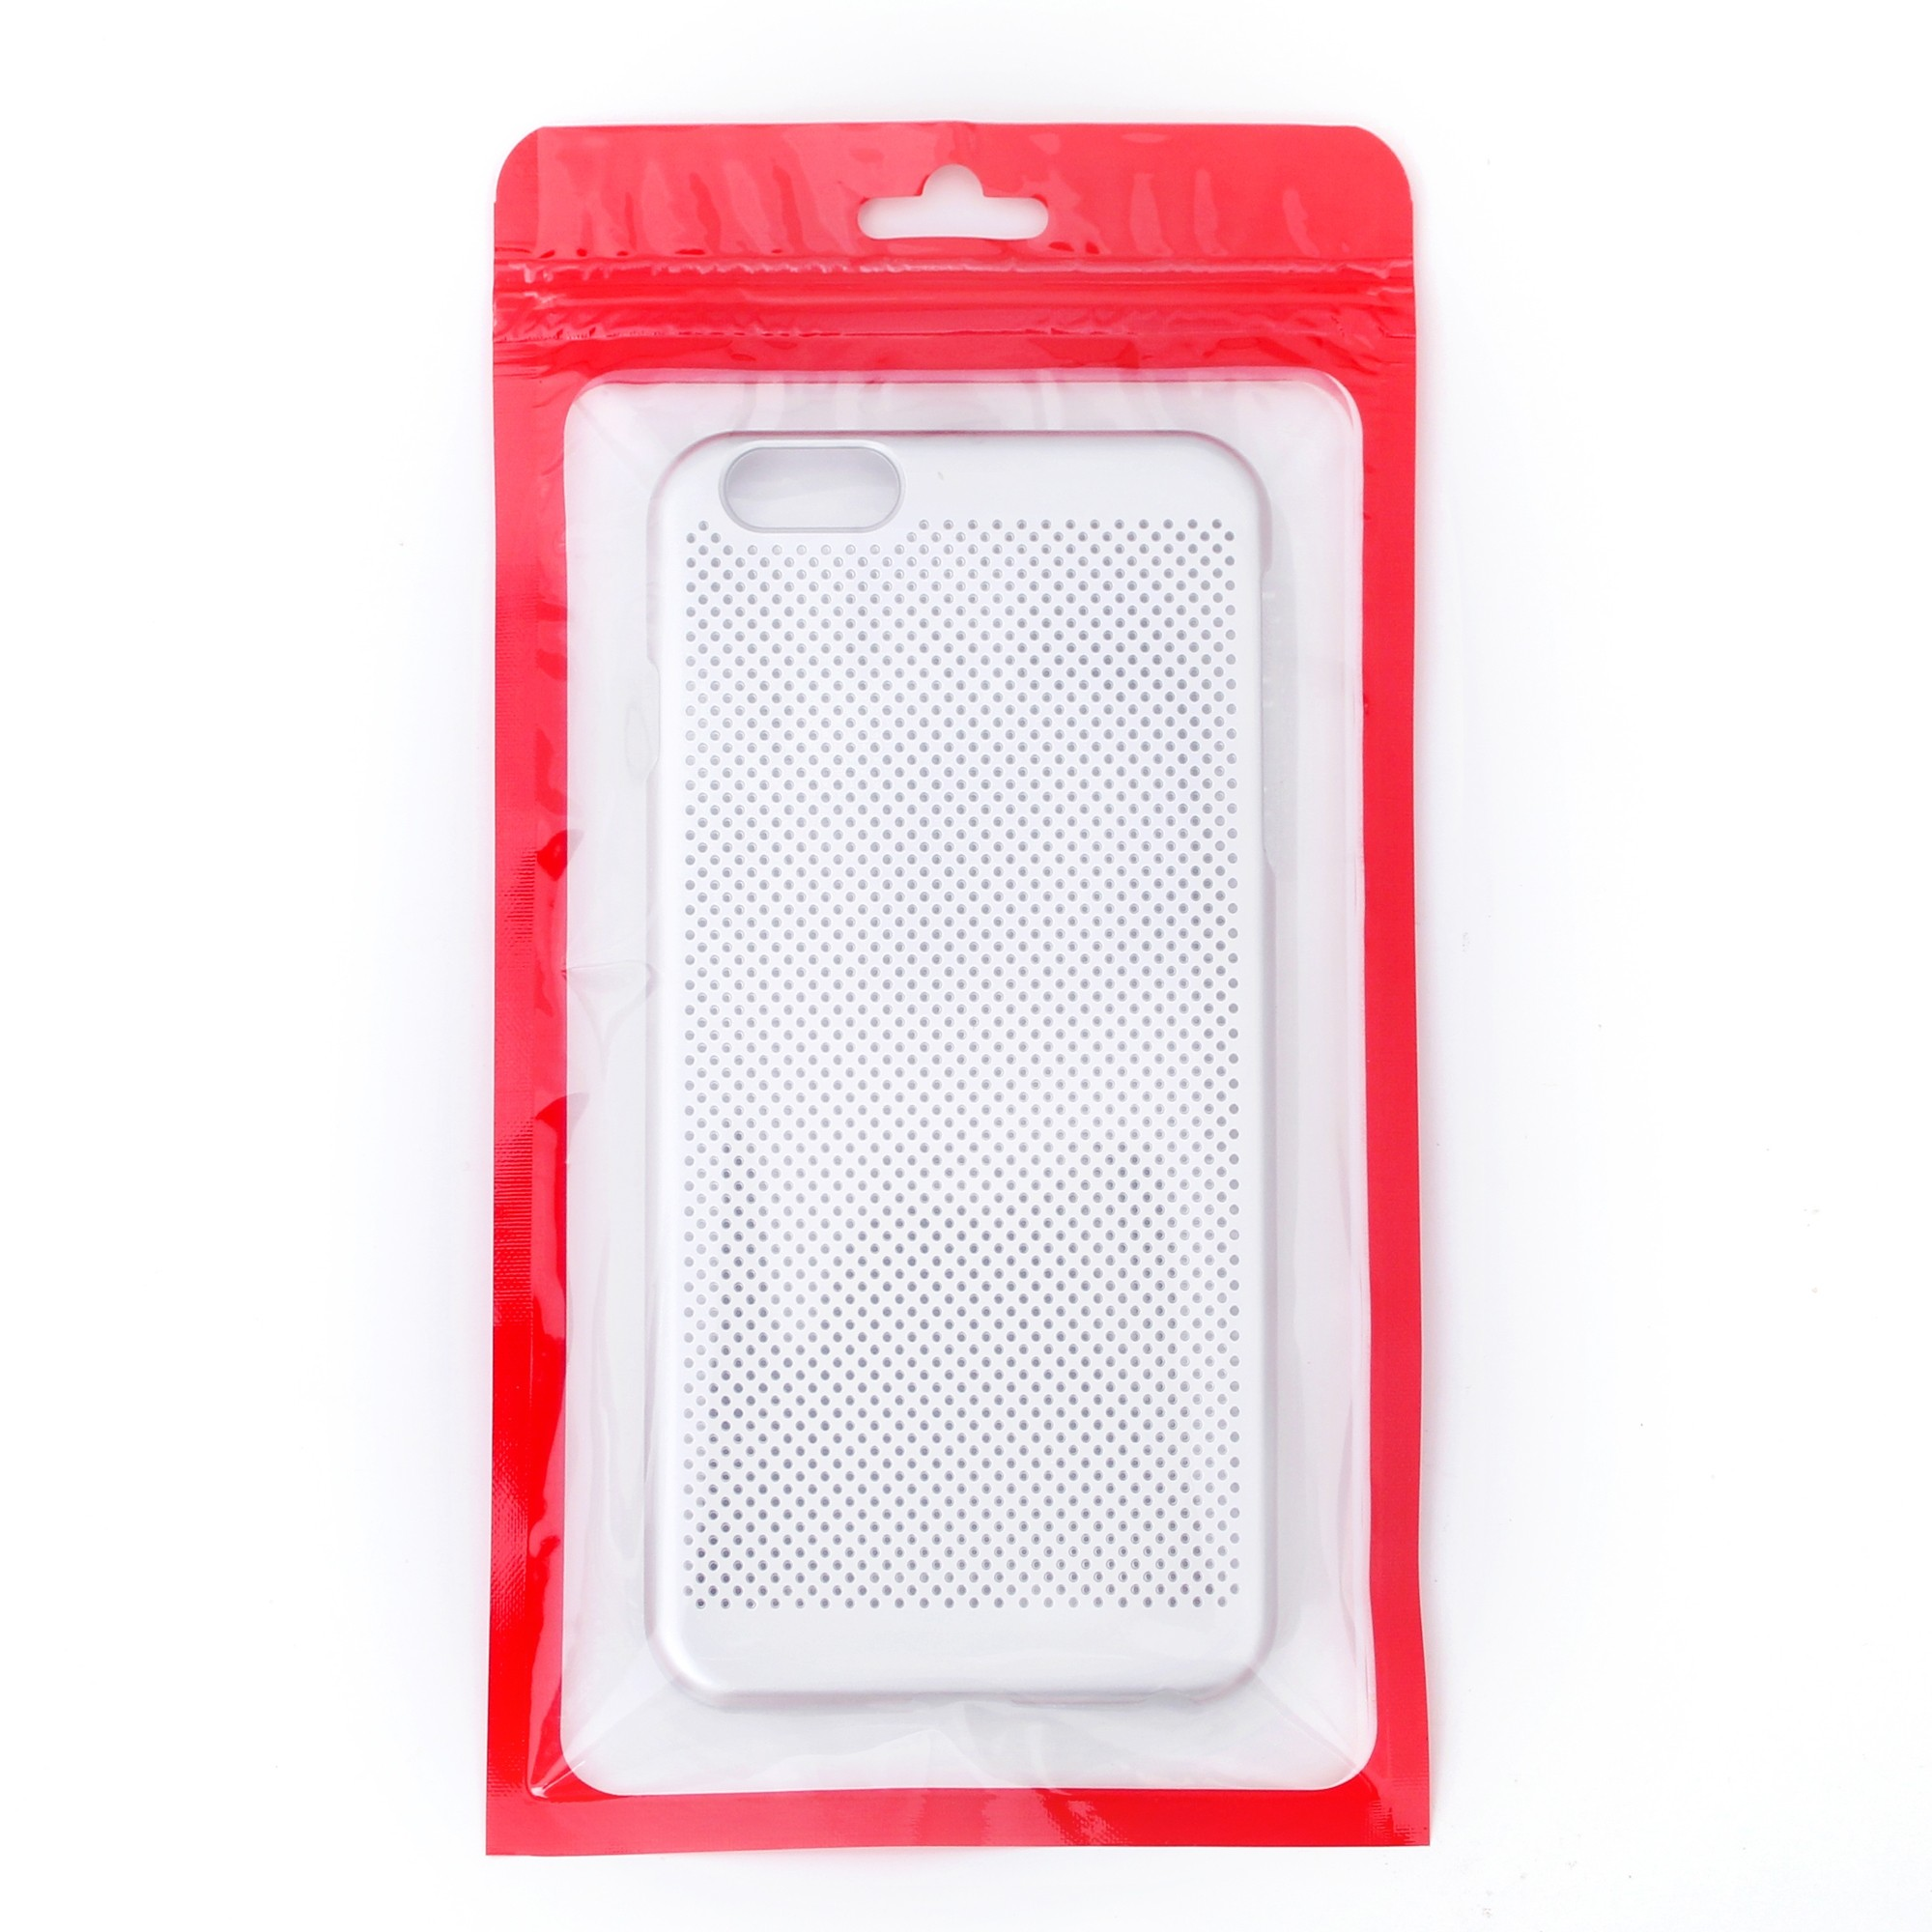 Transparent Red Border Plastic Rounded Corner Ziplock Bag